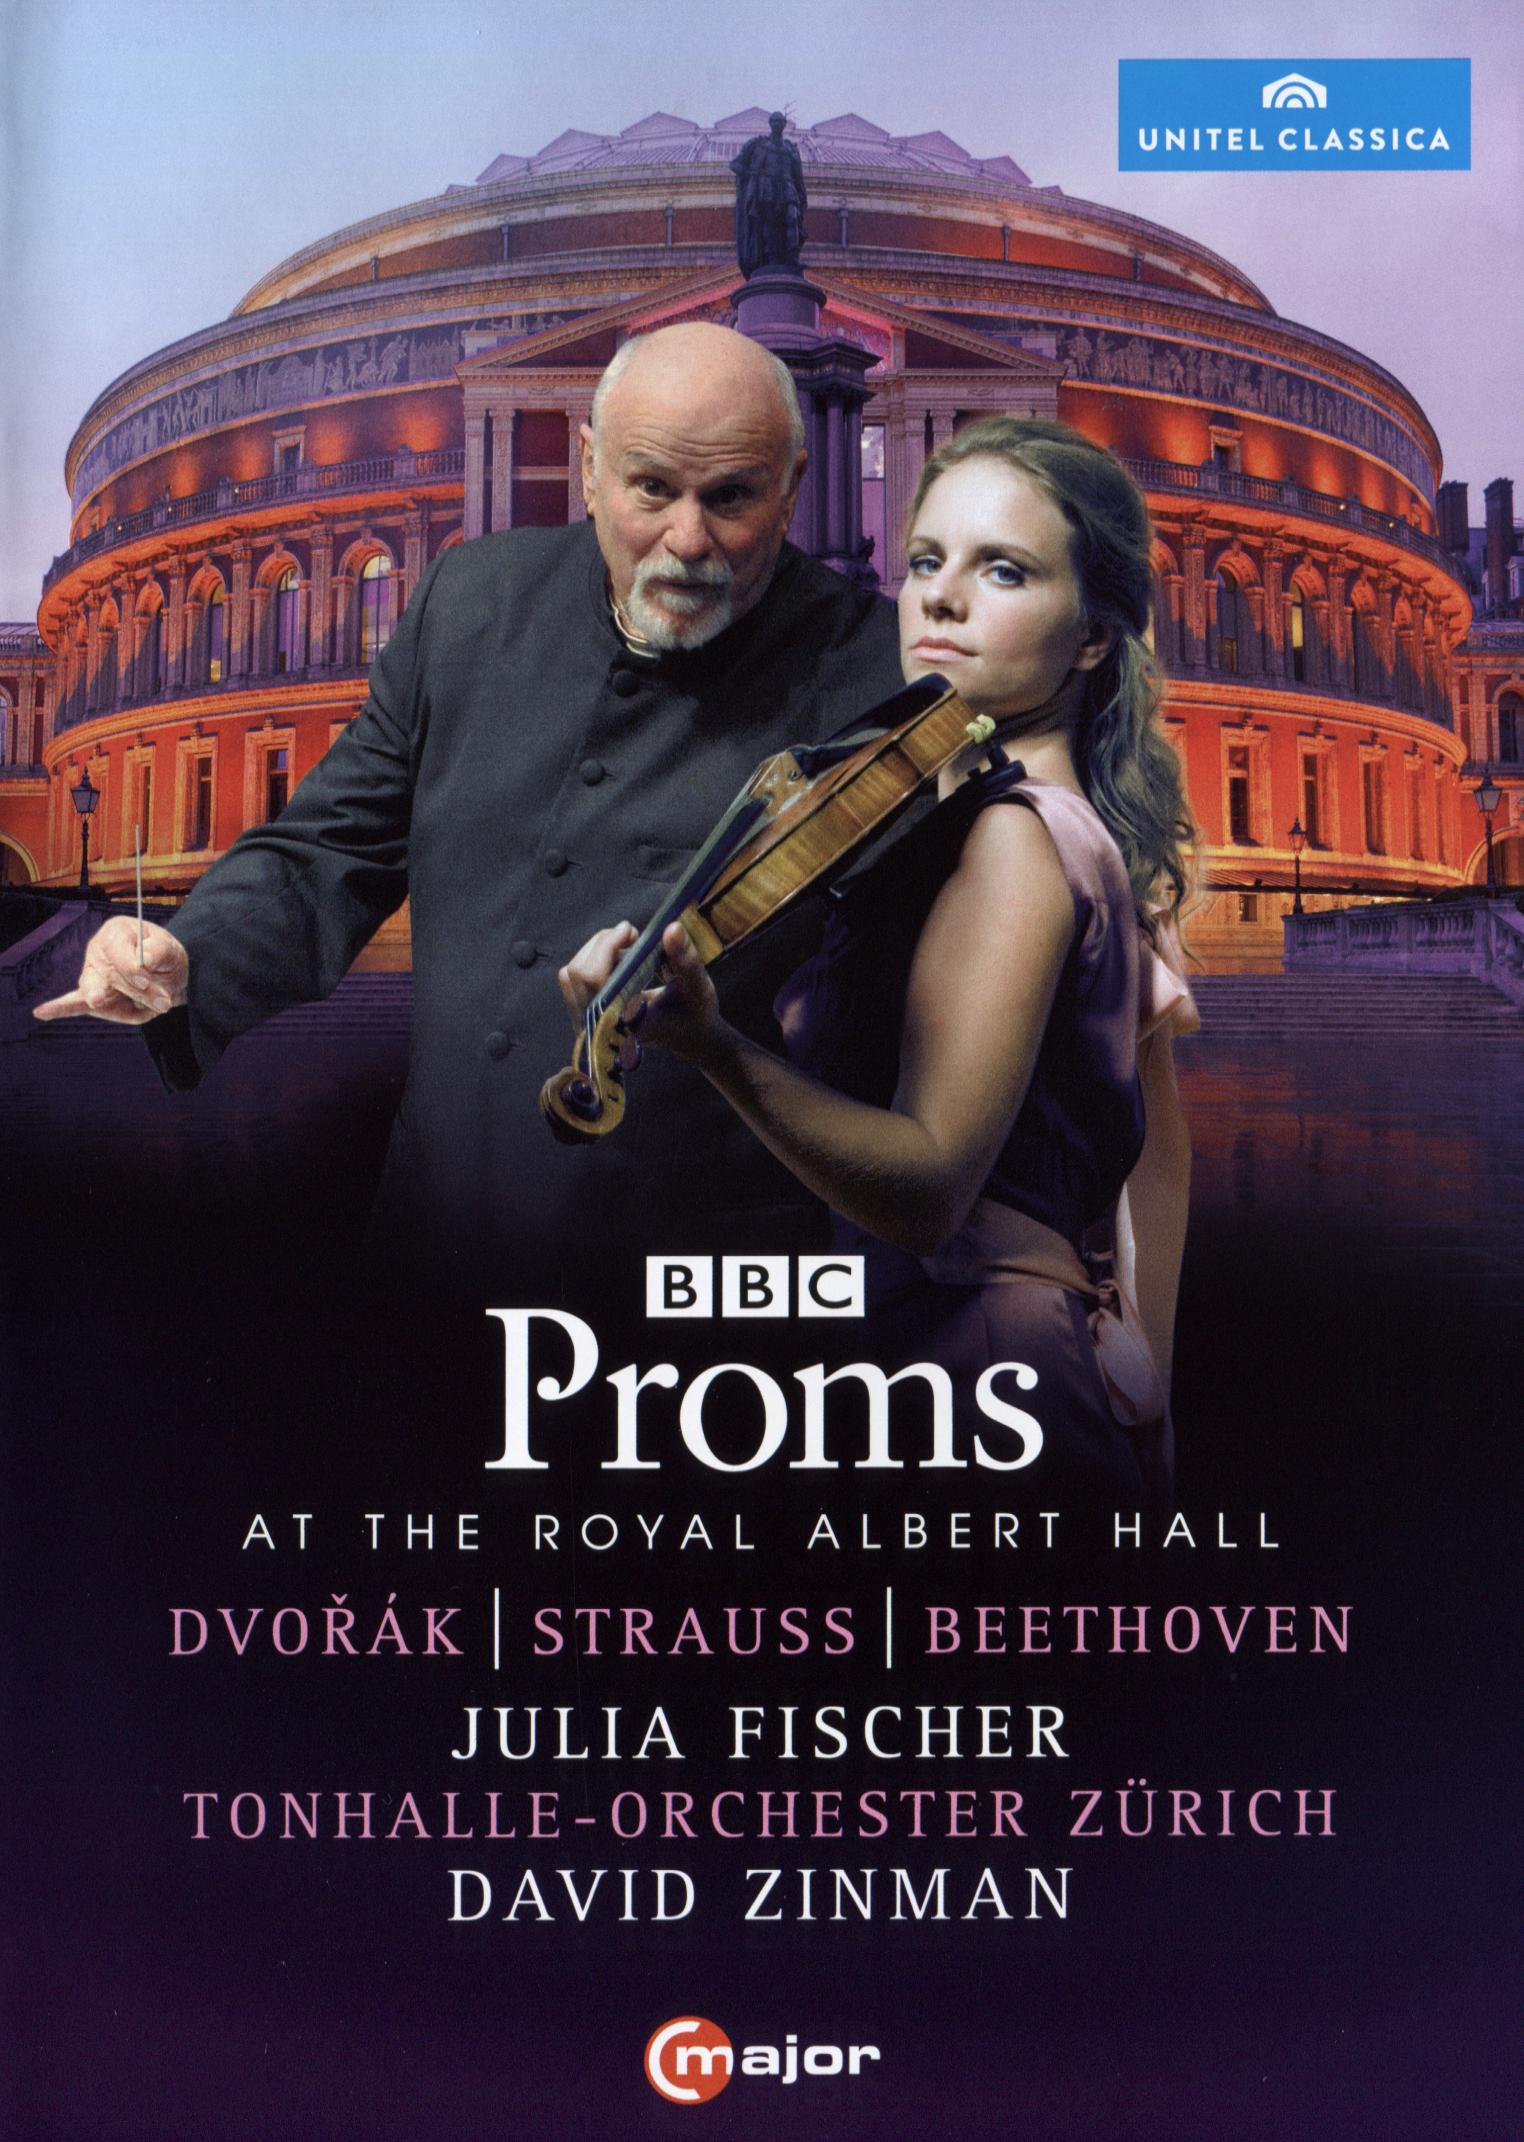 Julia Fischer: At the BBC Proms